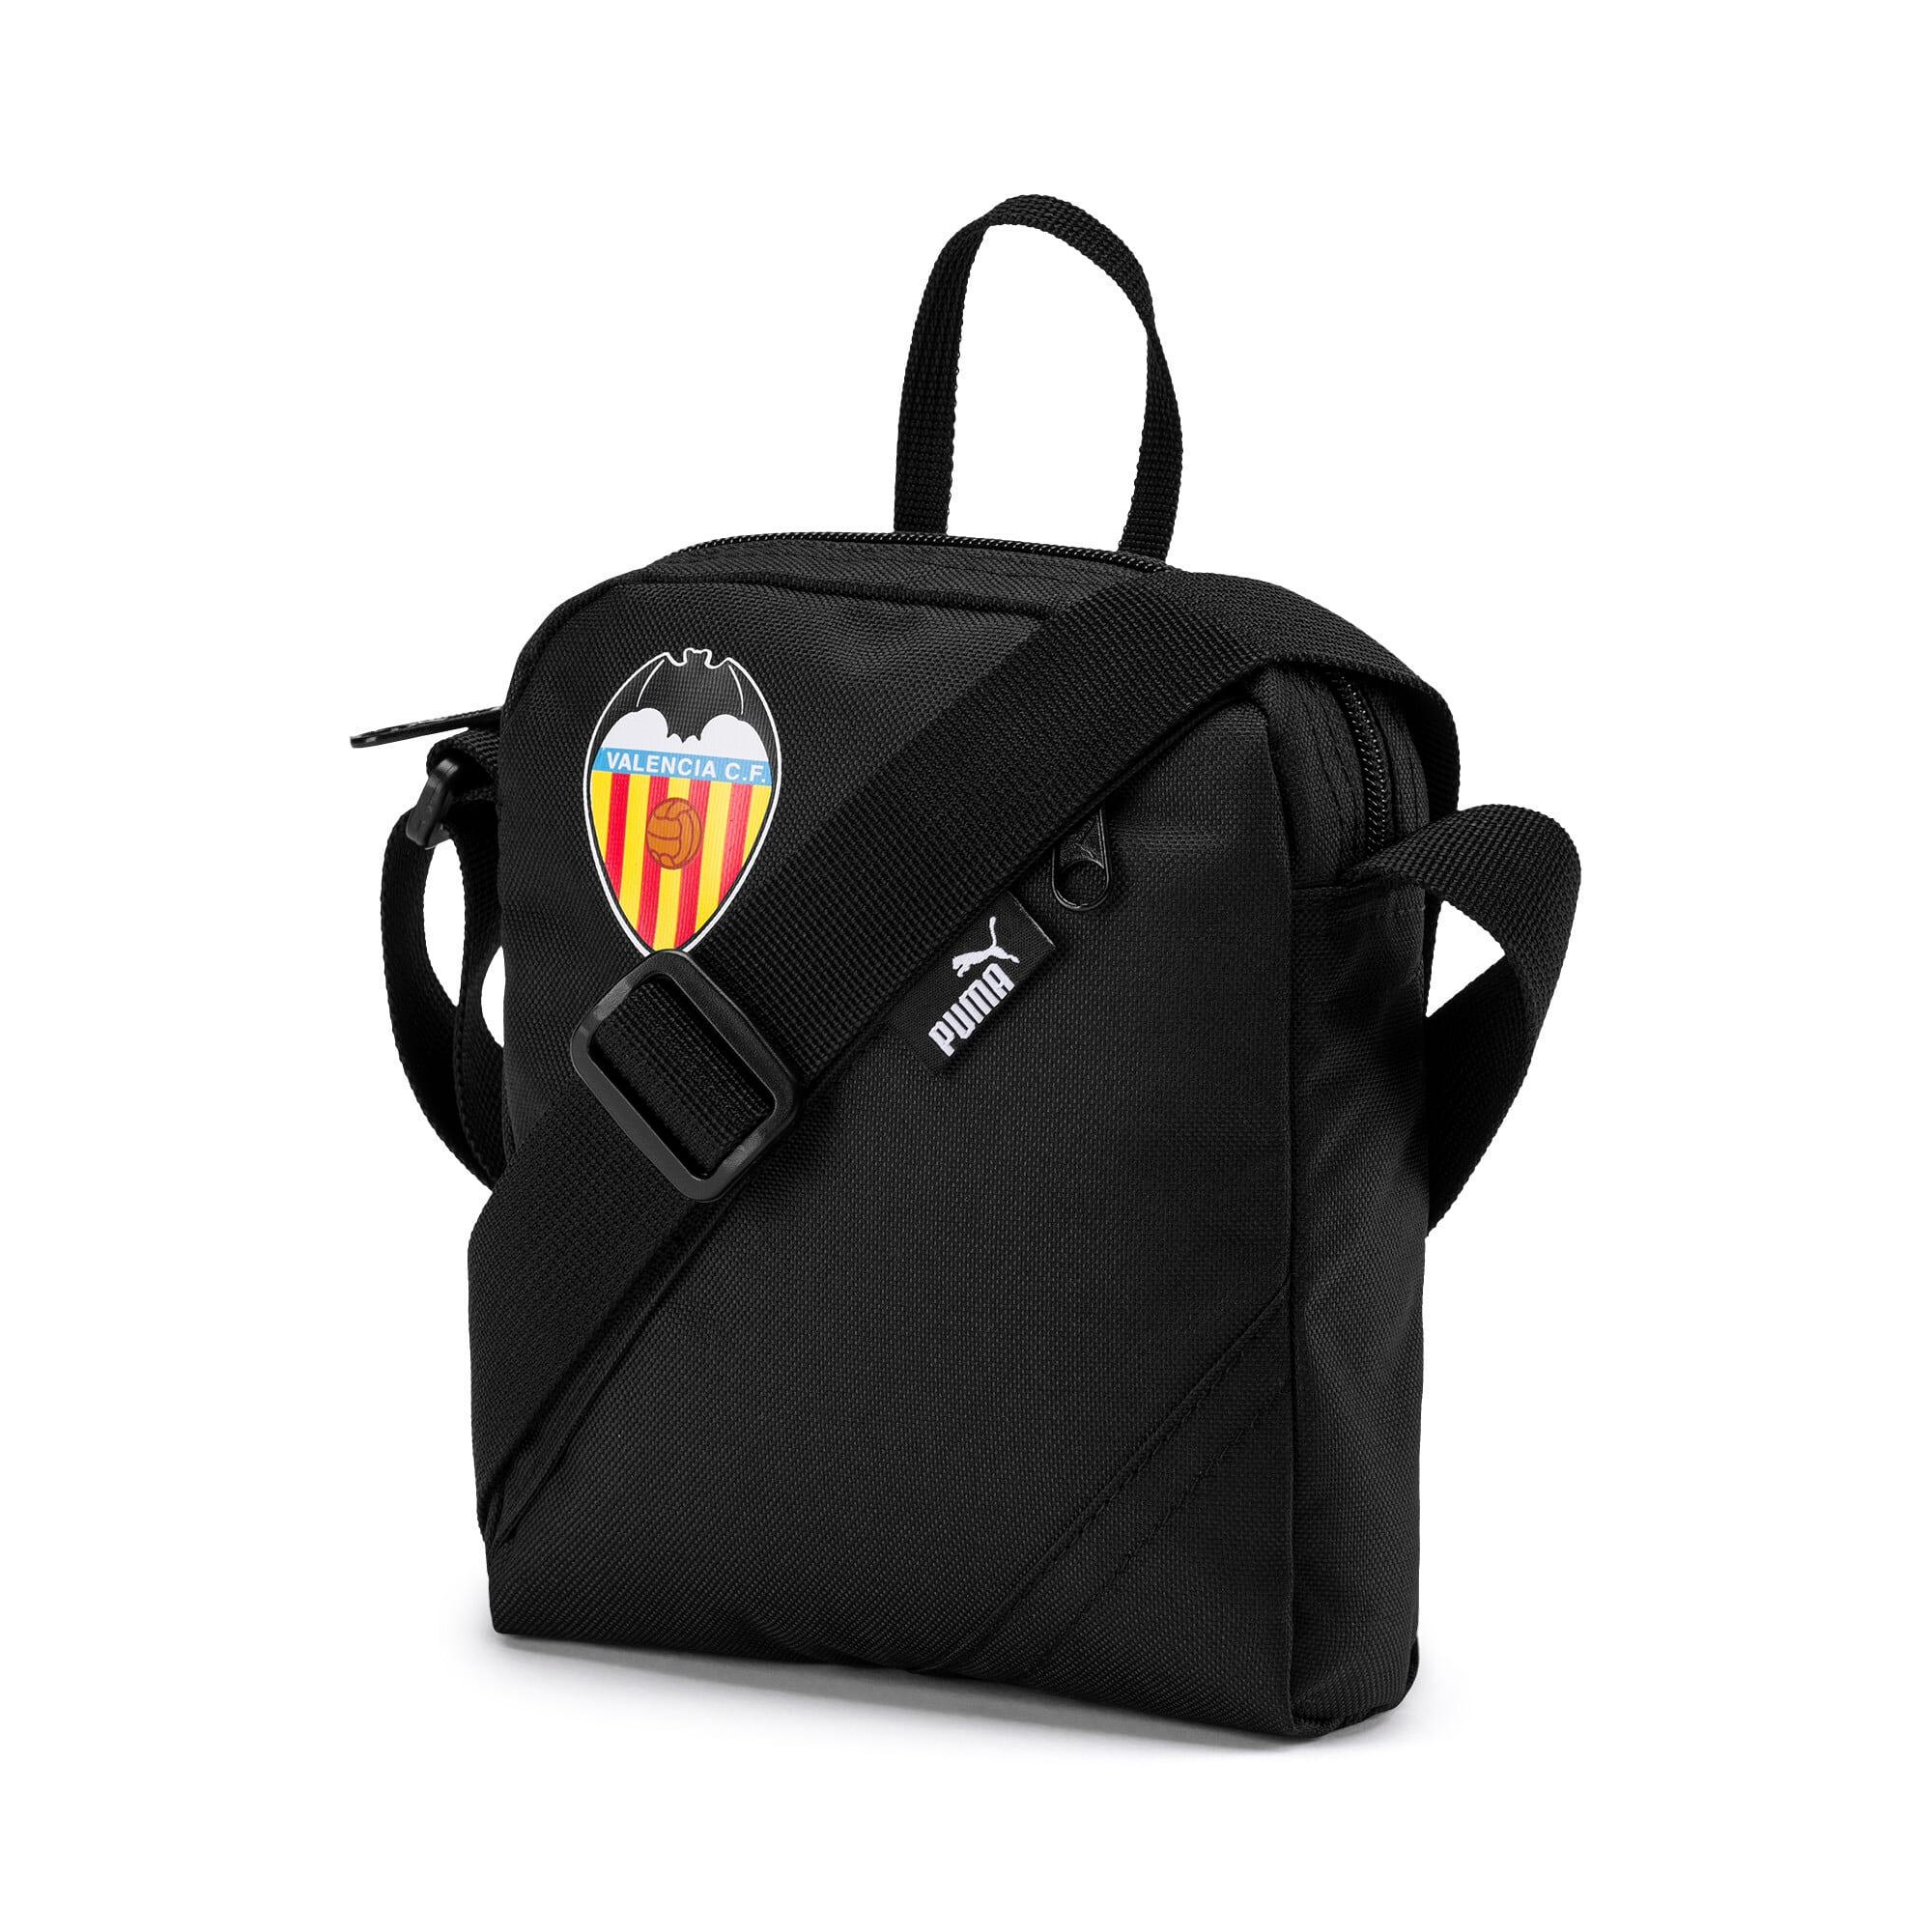 Thumbnail 1 of Valencia CF Portable City Bag, Puma Black-Puma White, medium